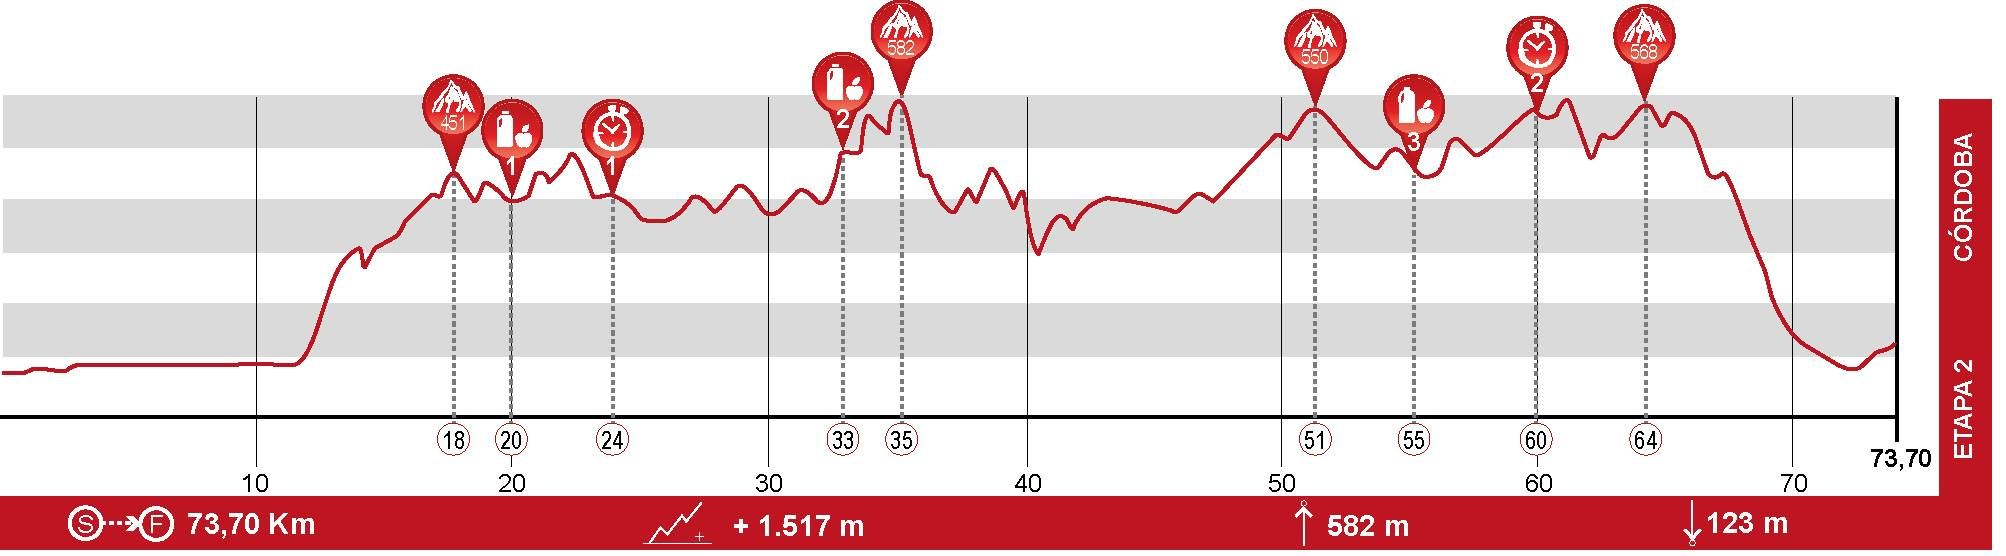 Andalucía Bike Race - Etapa 2